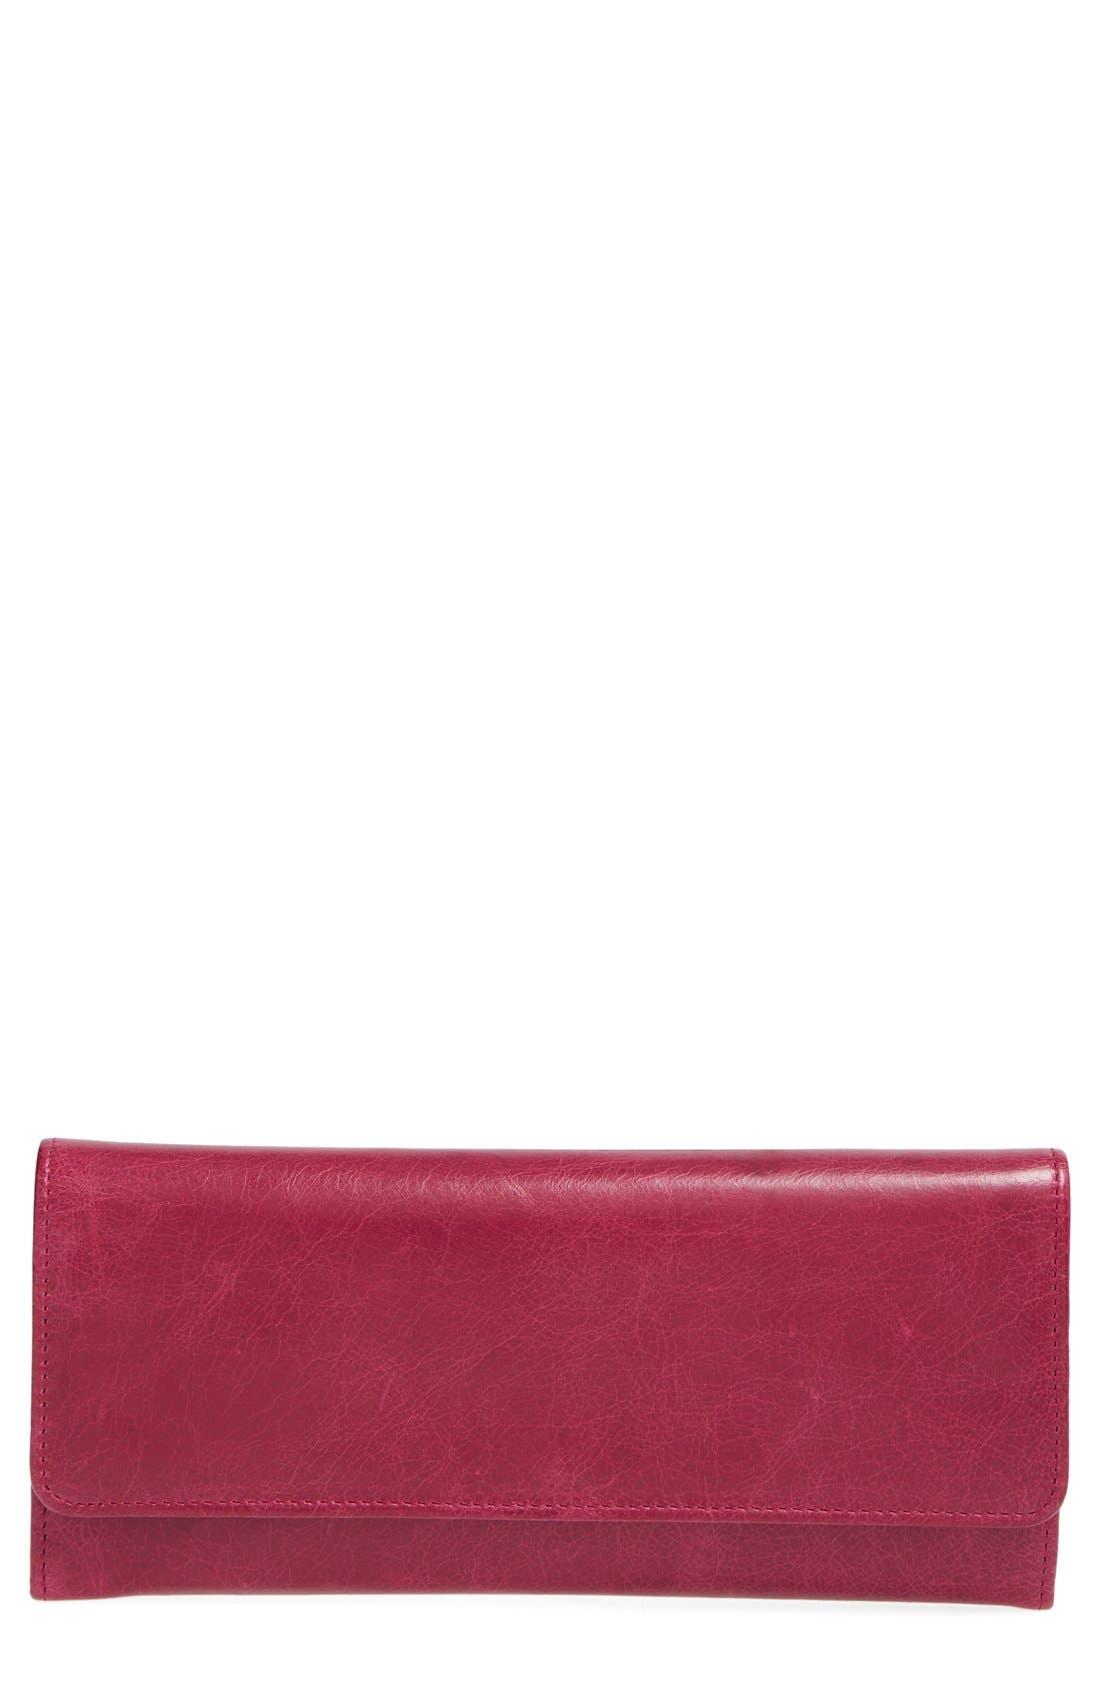 'Sadie' Leather Wallet,                             Main thumbnail 51, color,